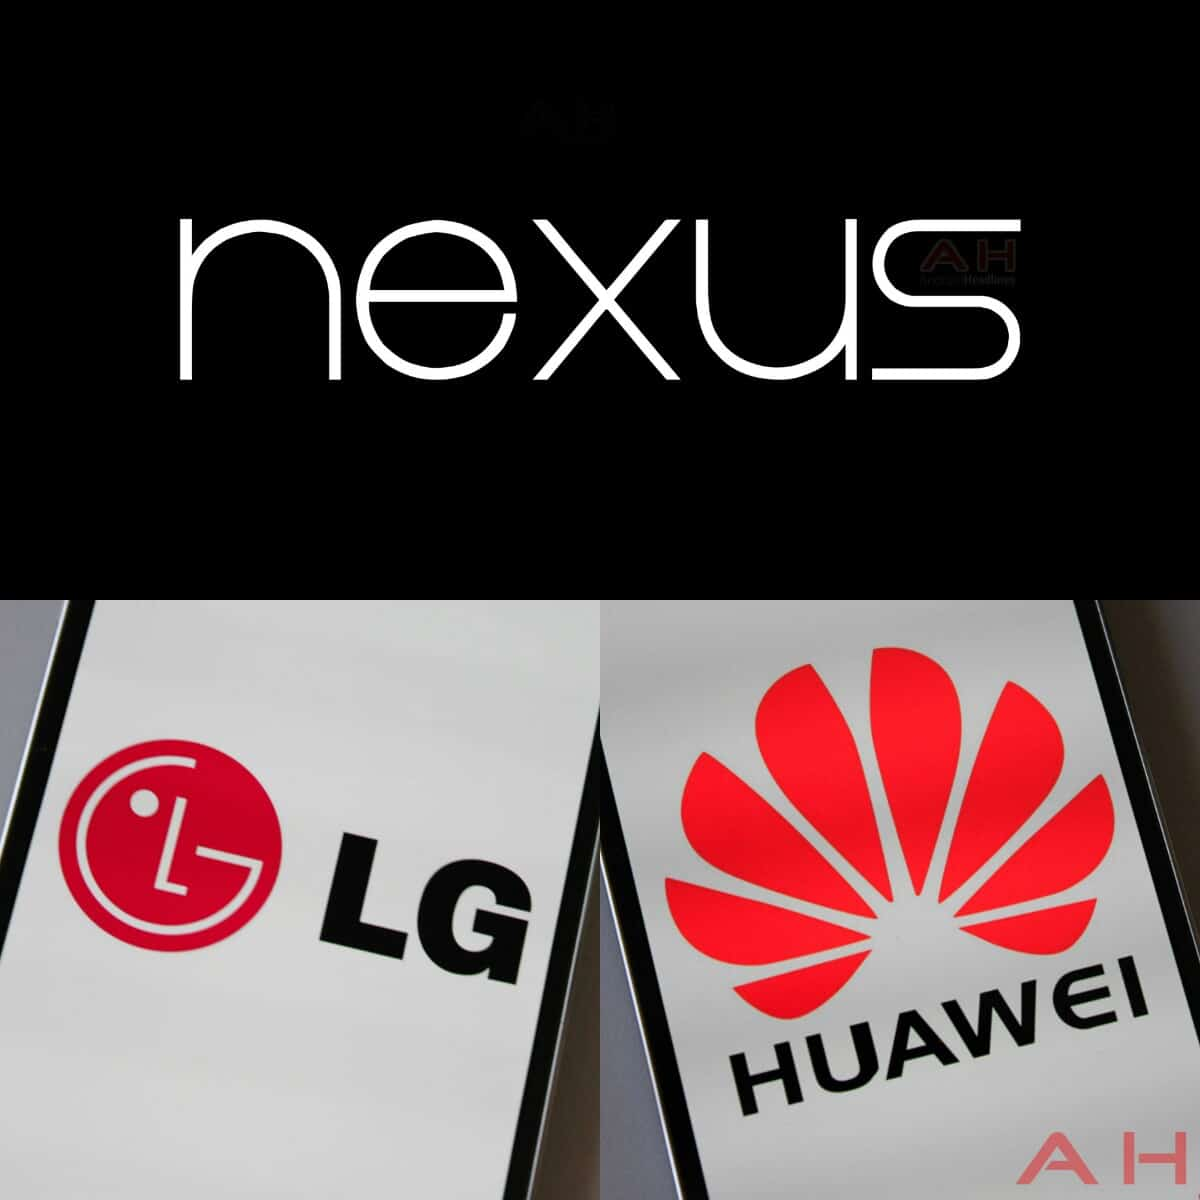 AH Huawei LG Nexus